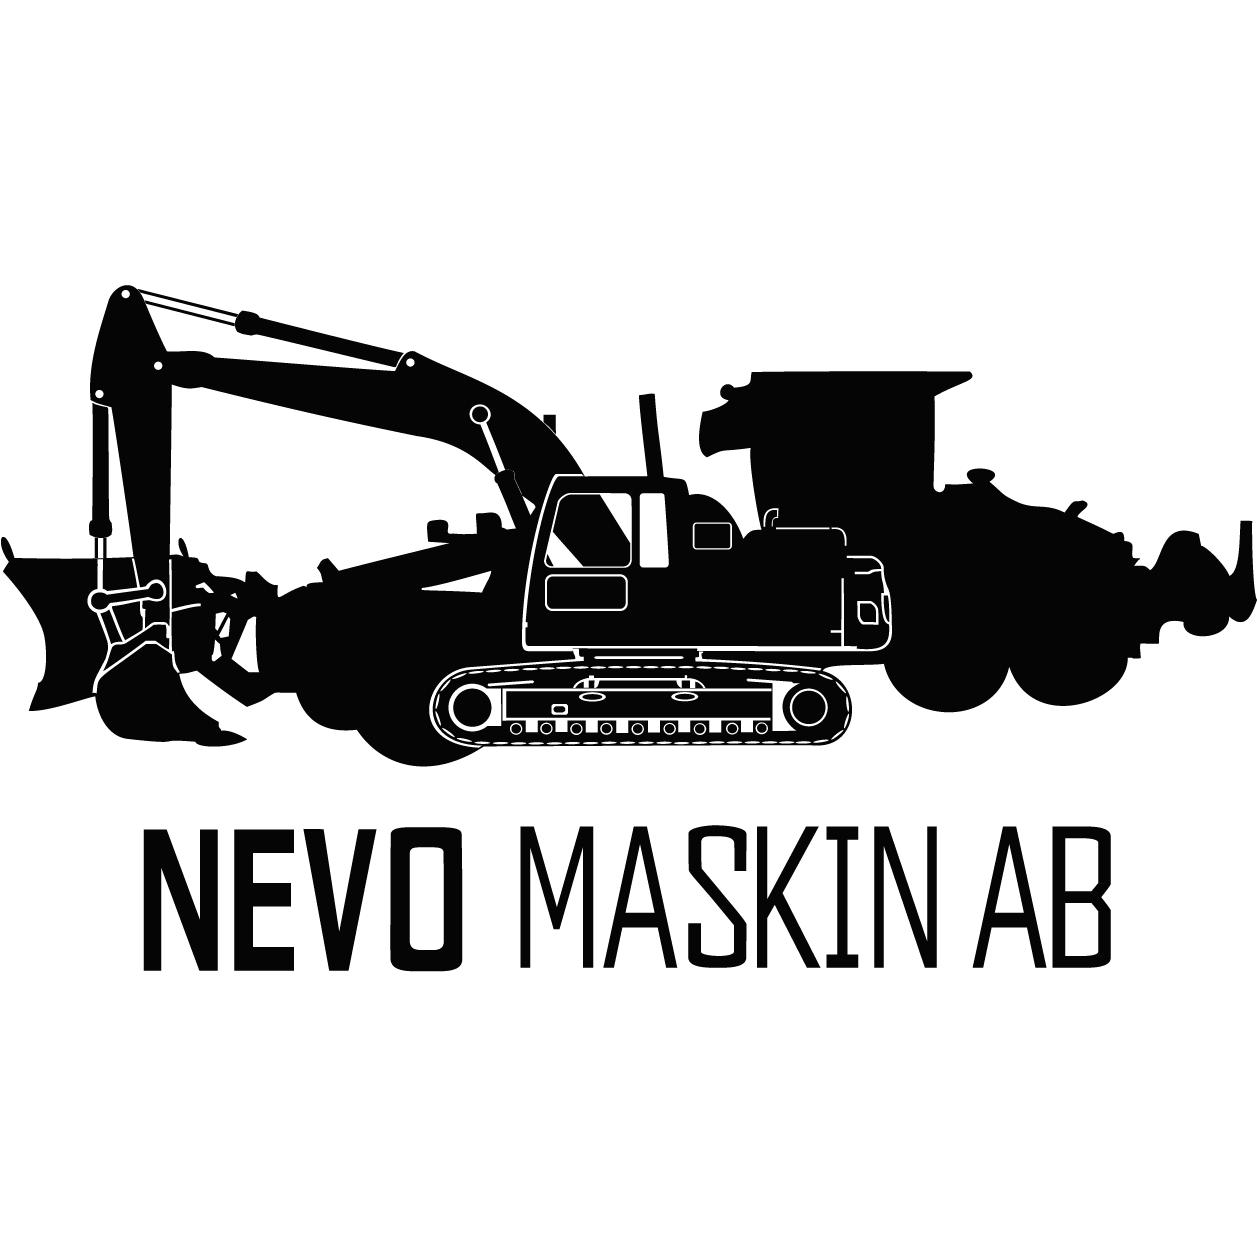 Nevo Maskin AB